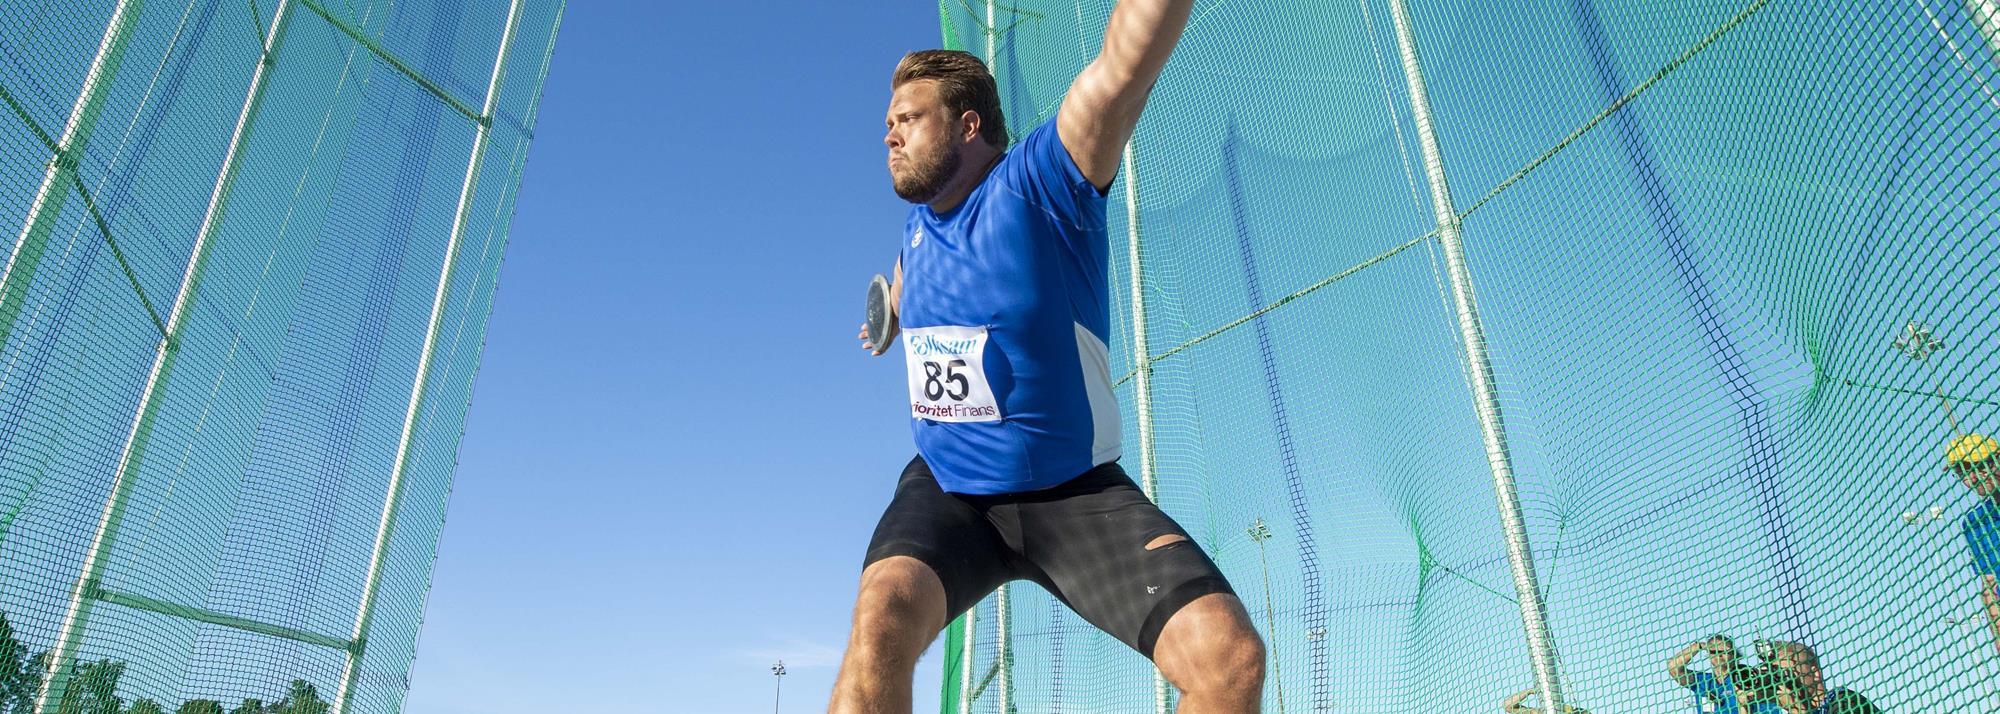 Stahl throws 71.37m in Sollentuna